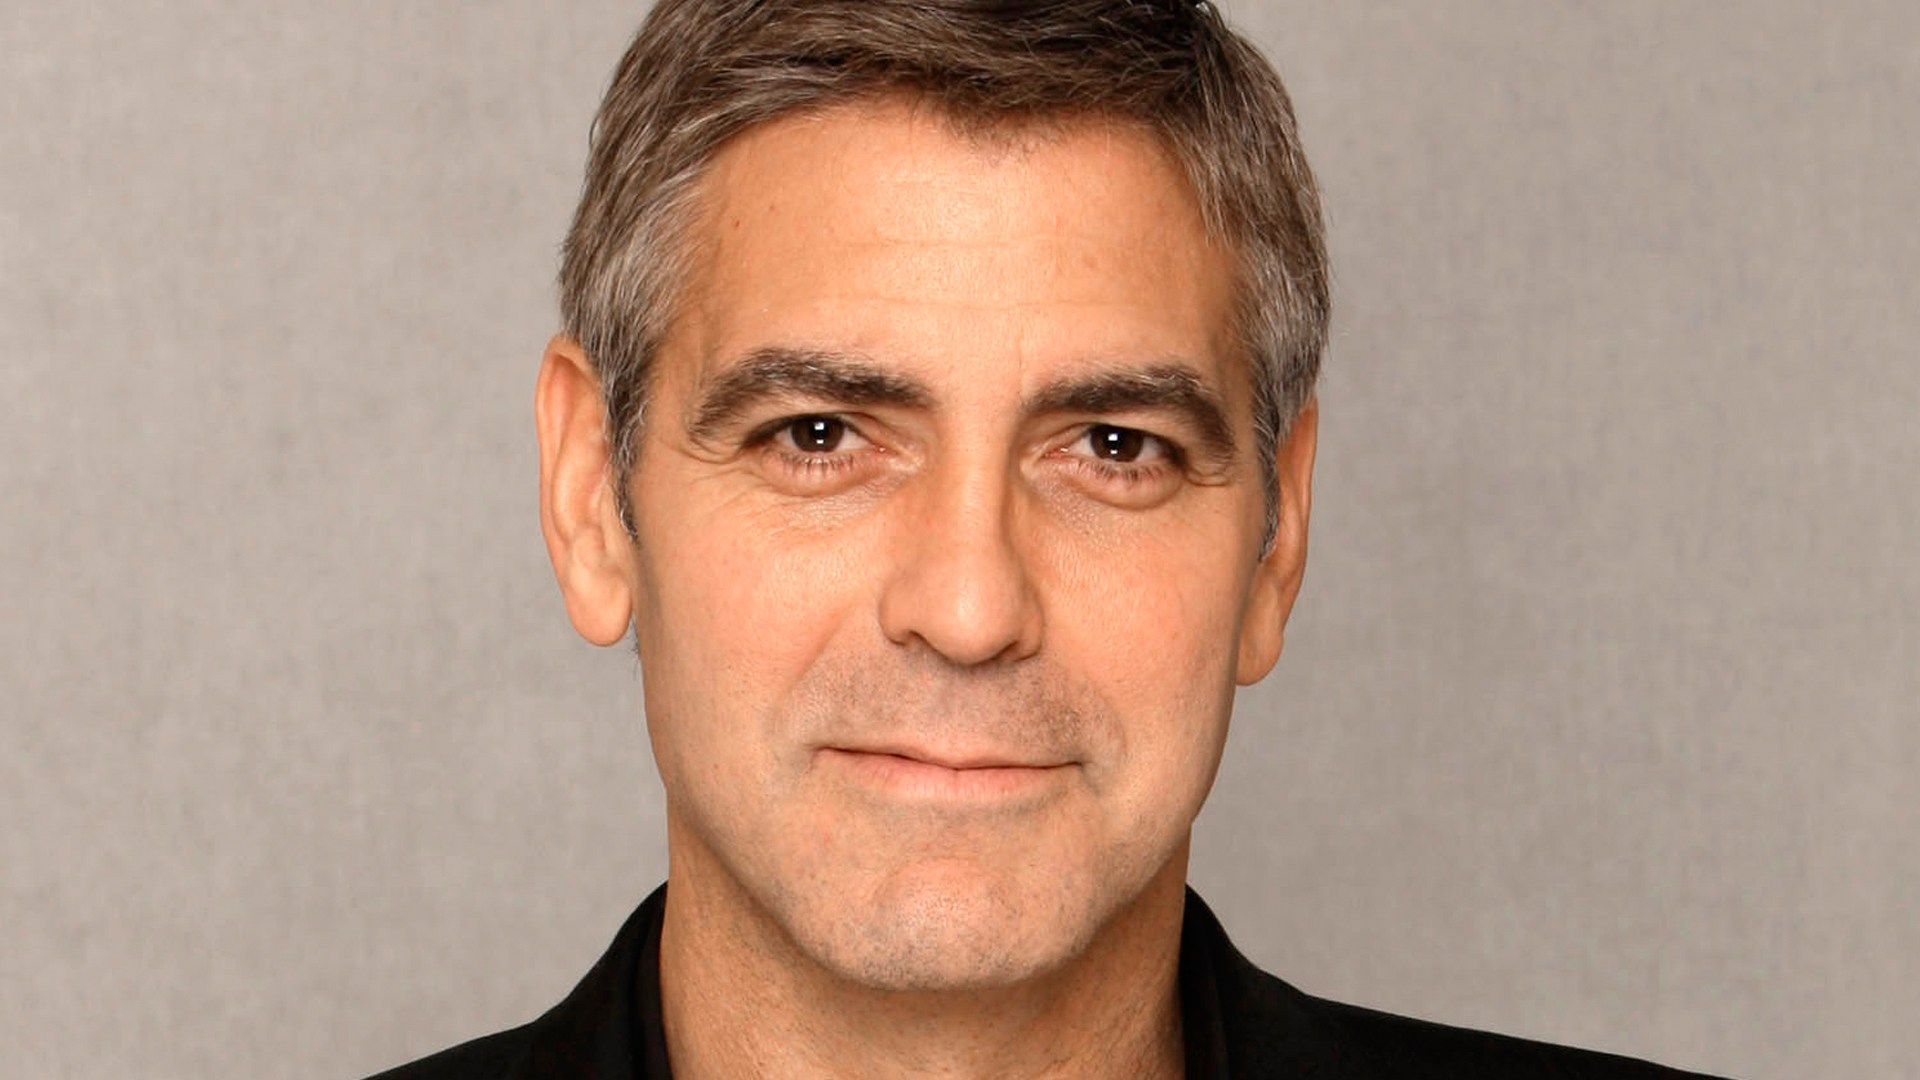 George Clooney acting advice